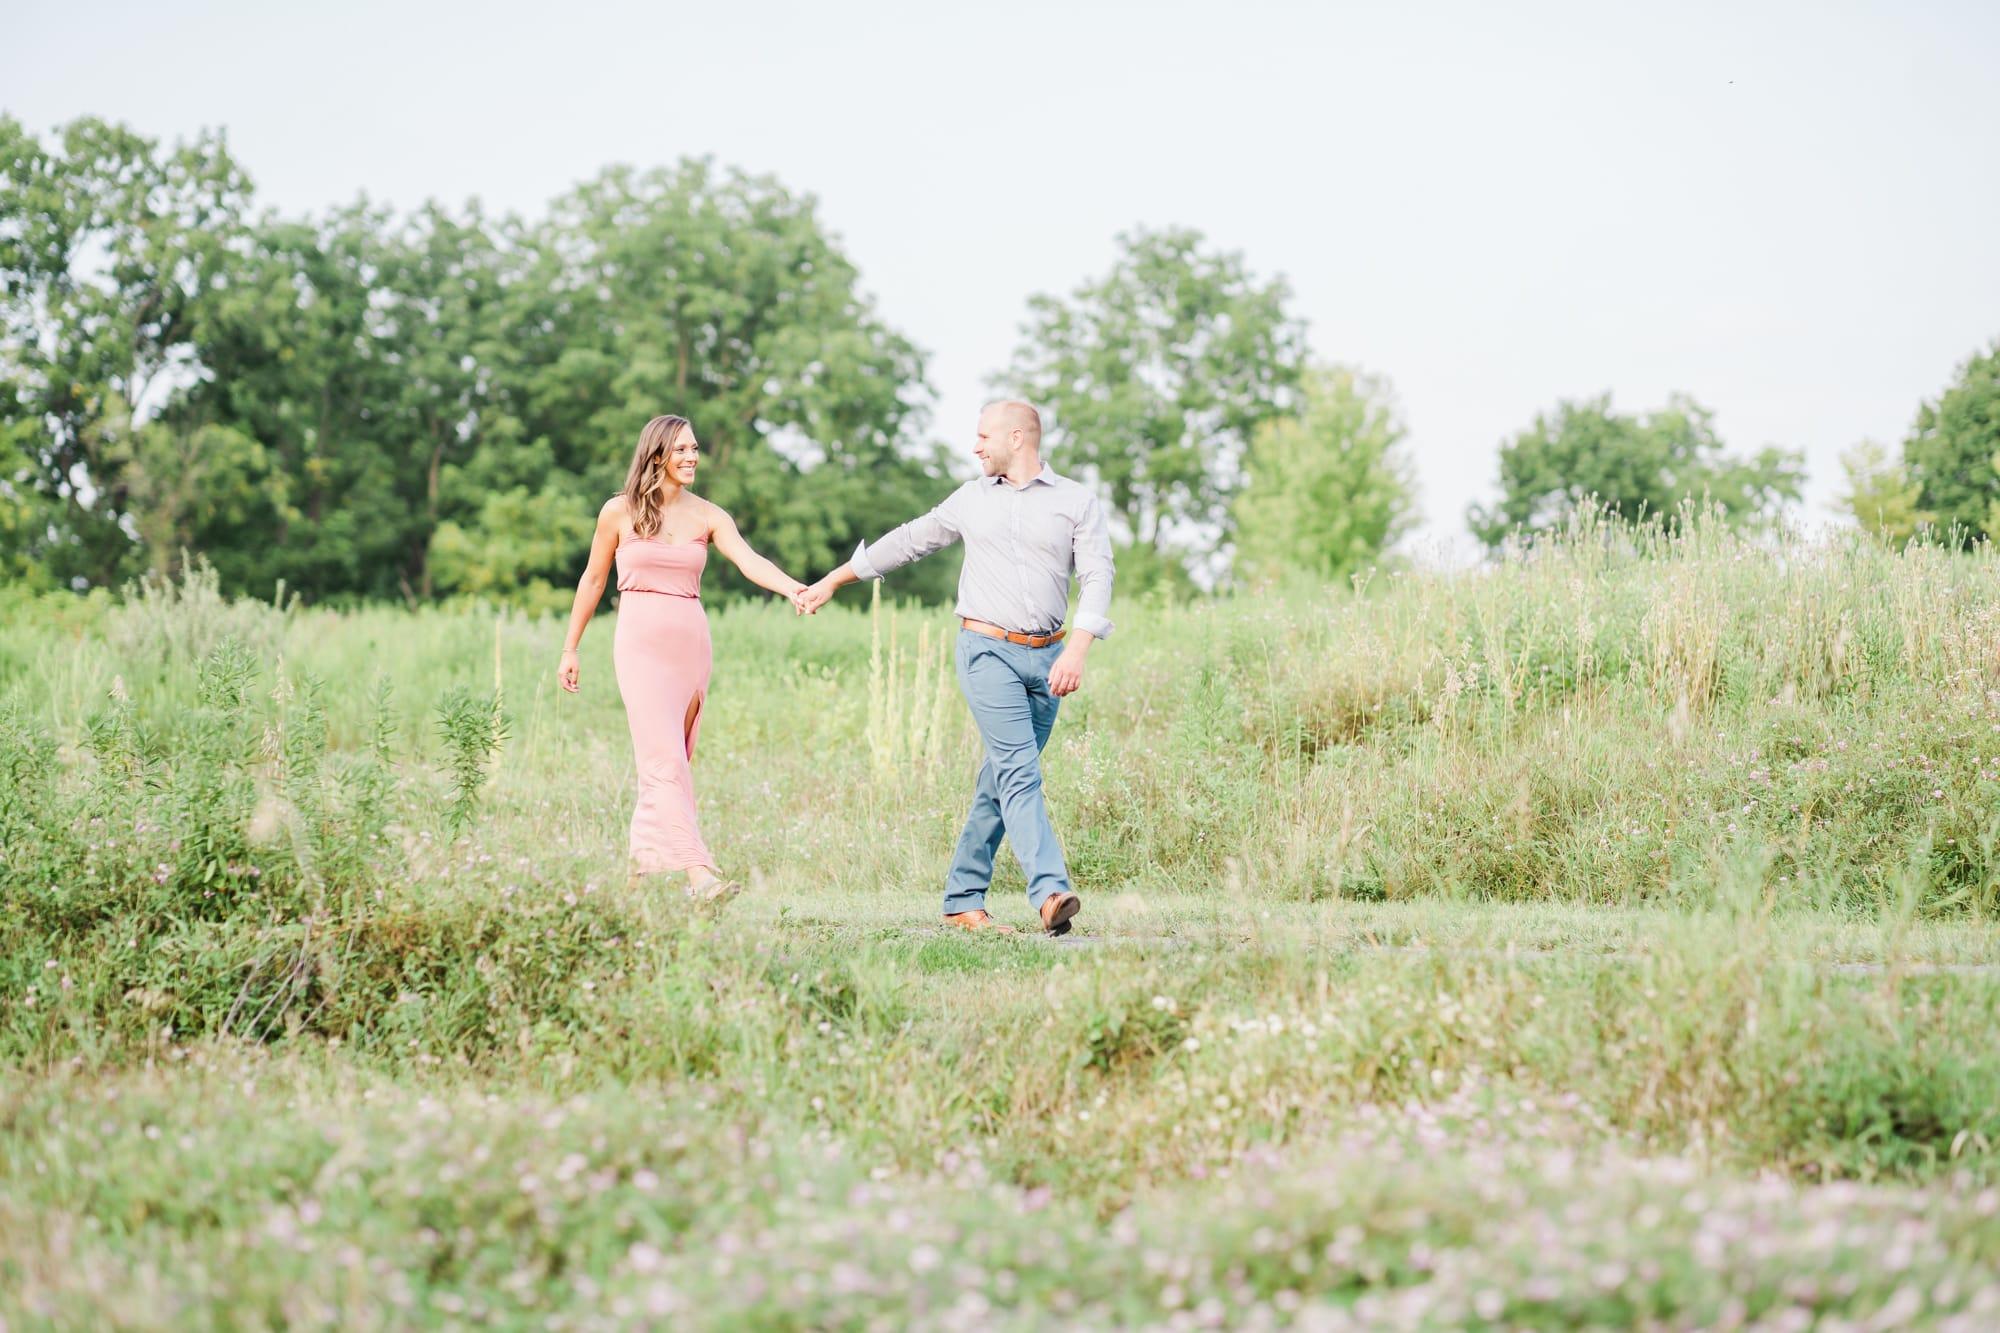 Engagement photos at Oak Hall Regional Park in Boalsburg